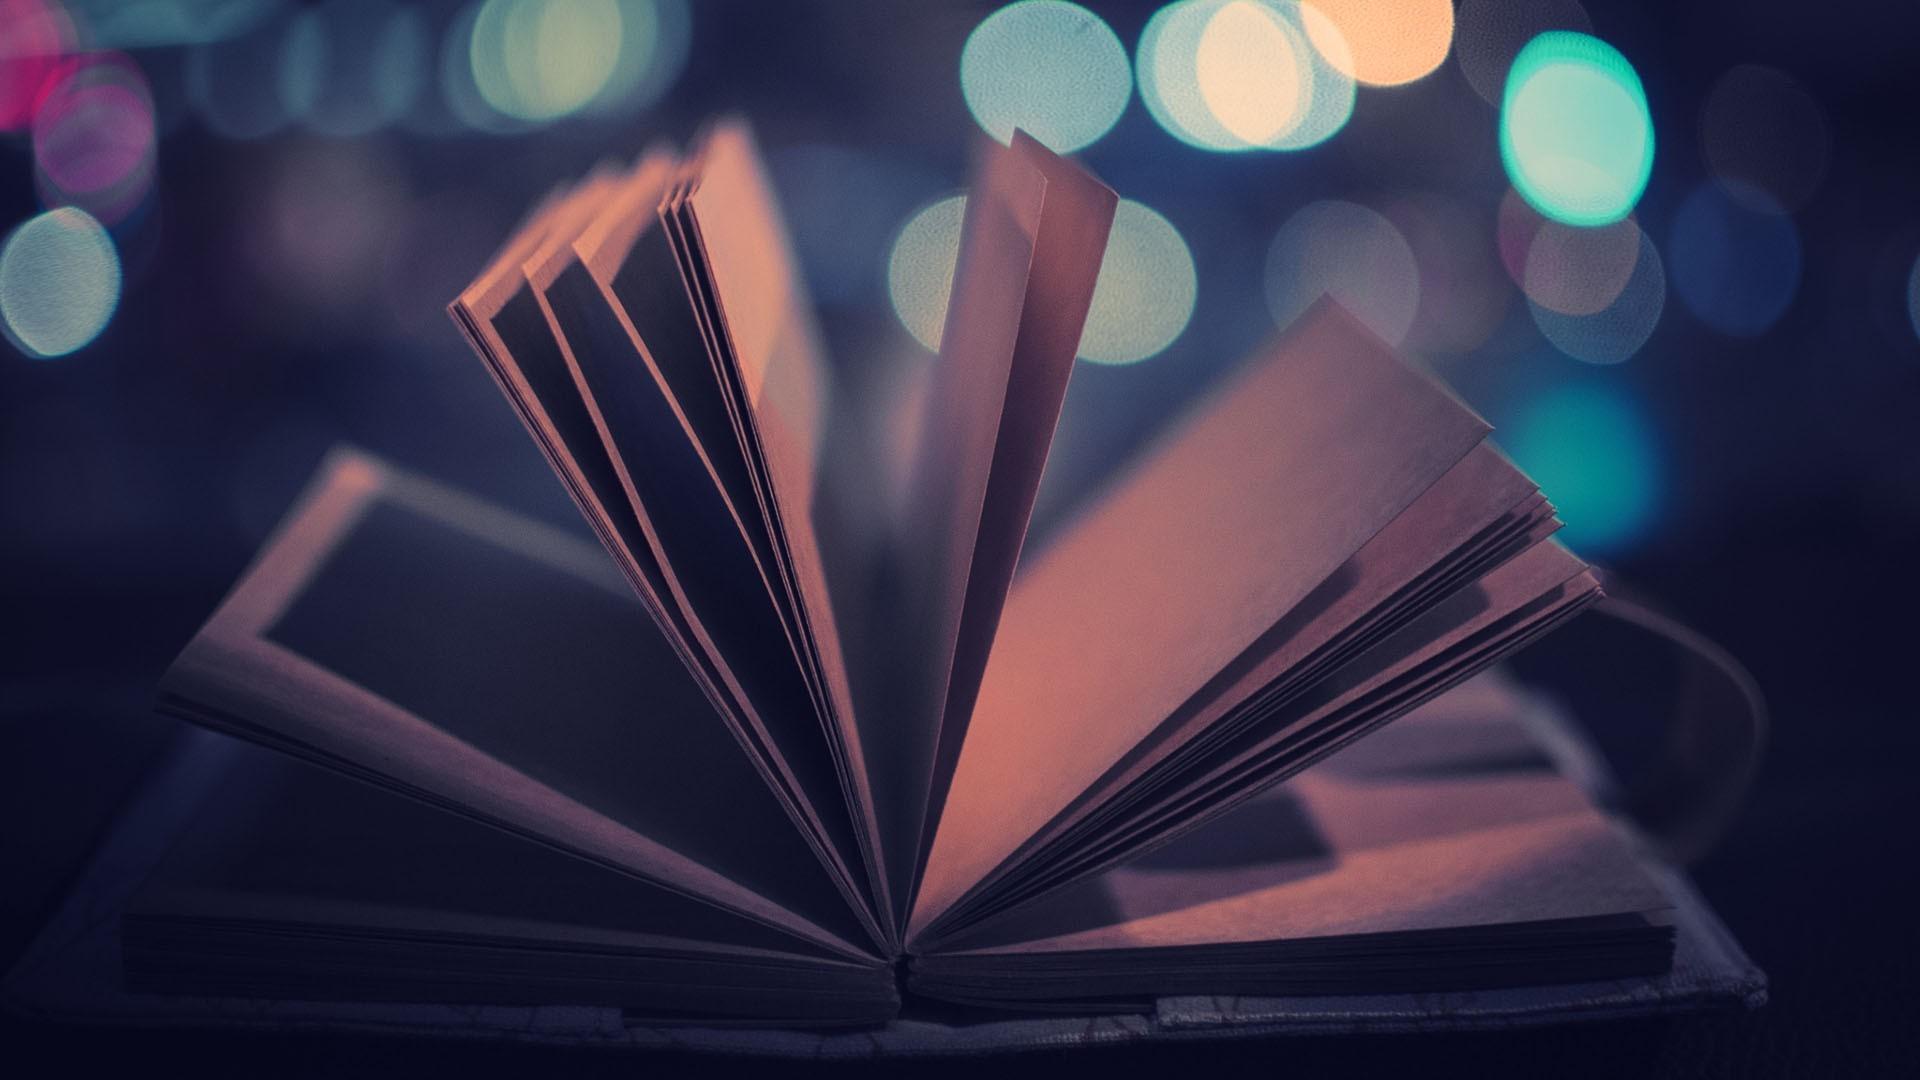 Book Cover Photography Questions : Livre full hd fond d écran and arrière plan